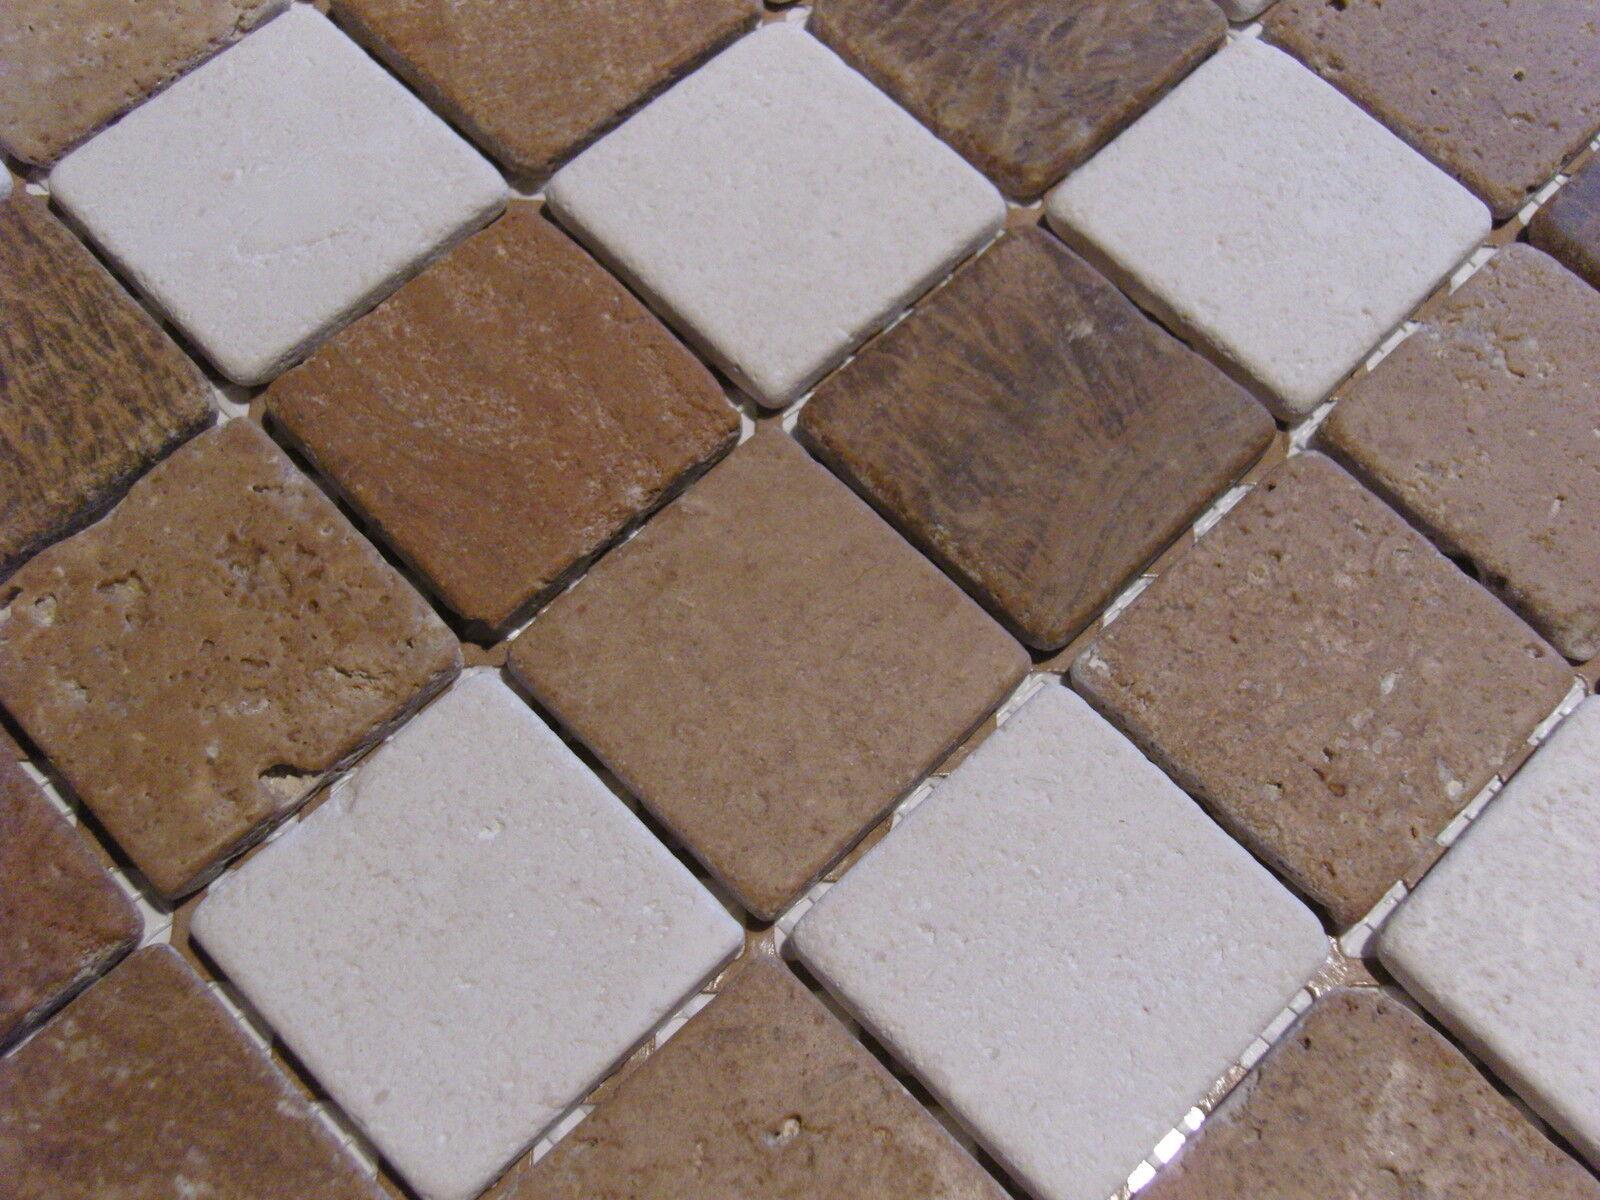 1 qm - Bad Fliese Naturstein Marmor Mosaik braun weiss hell TOP - antik style